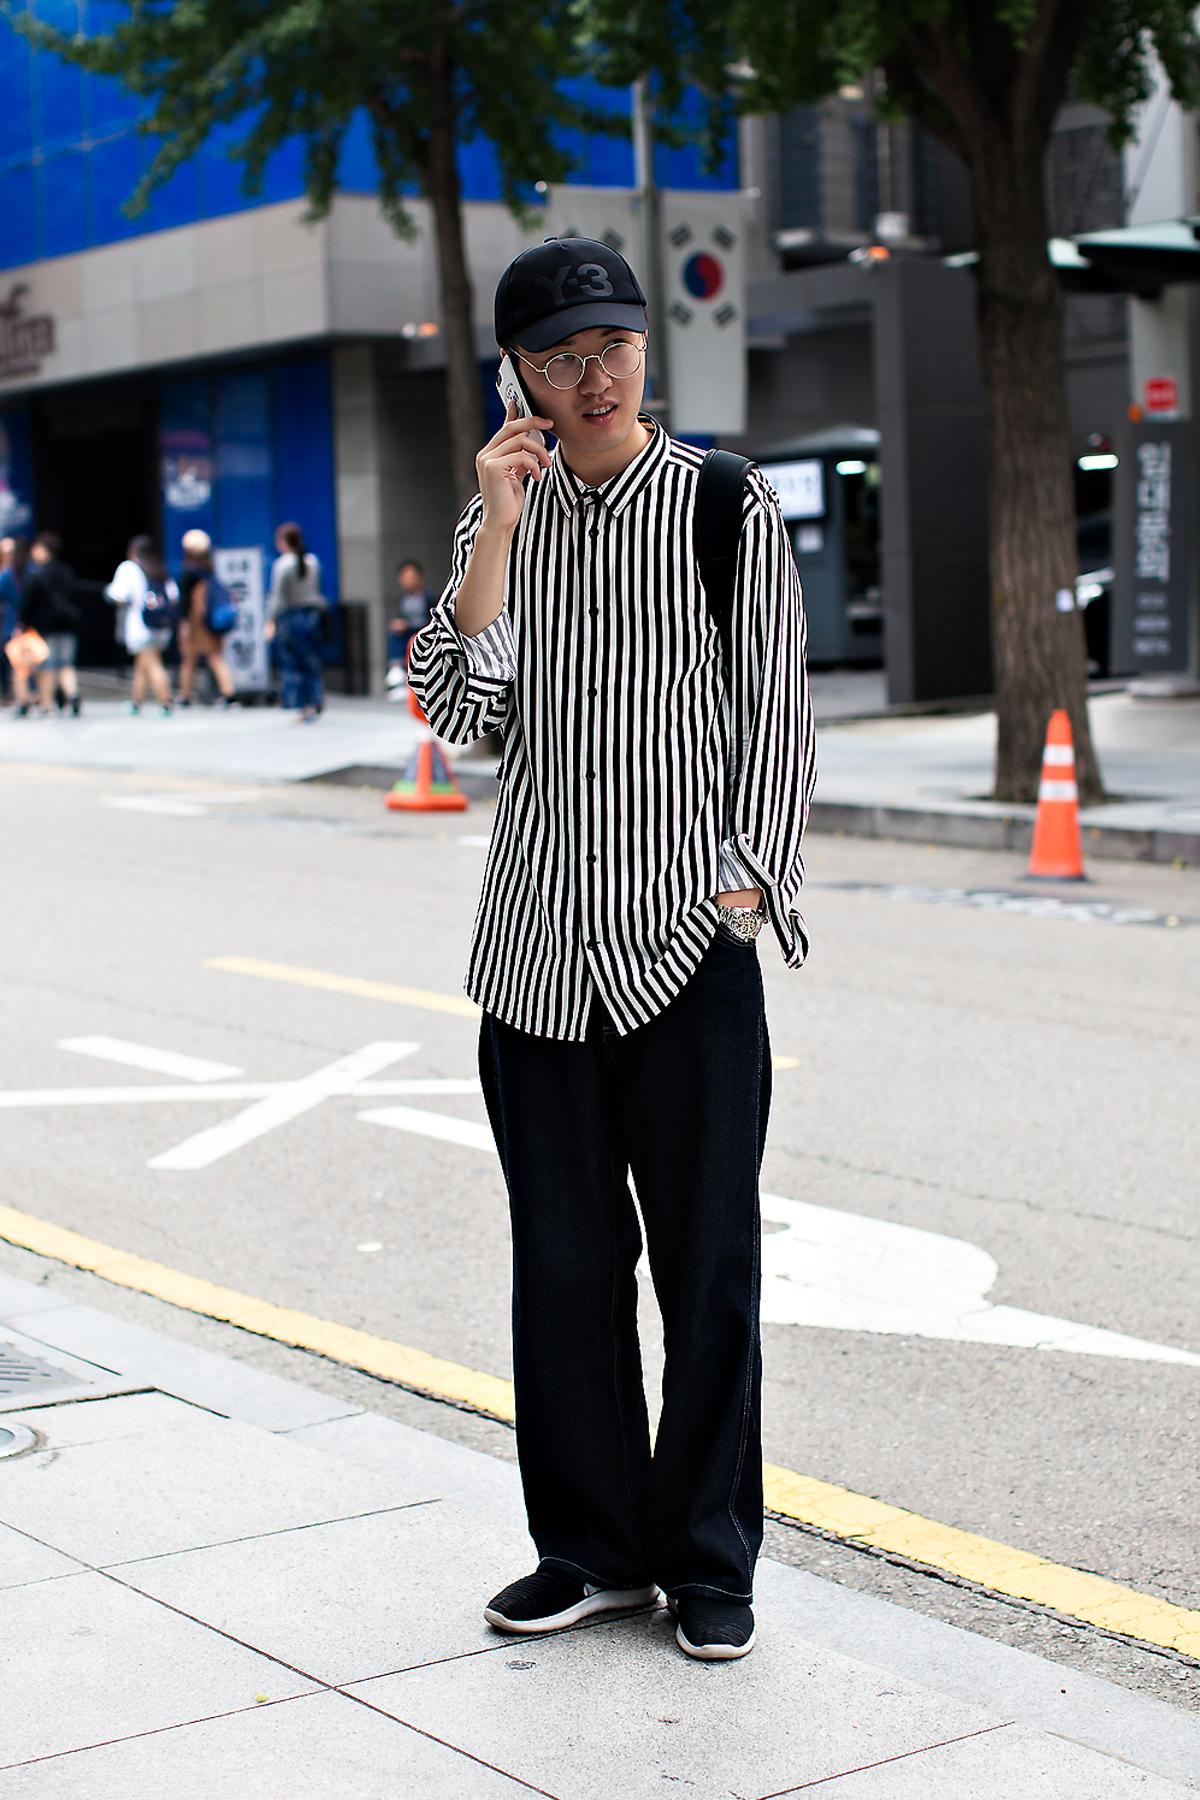 Lee Jaedoo, Street Fashion 2017 in Seoul.jpg